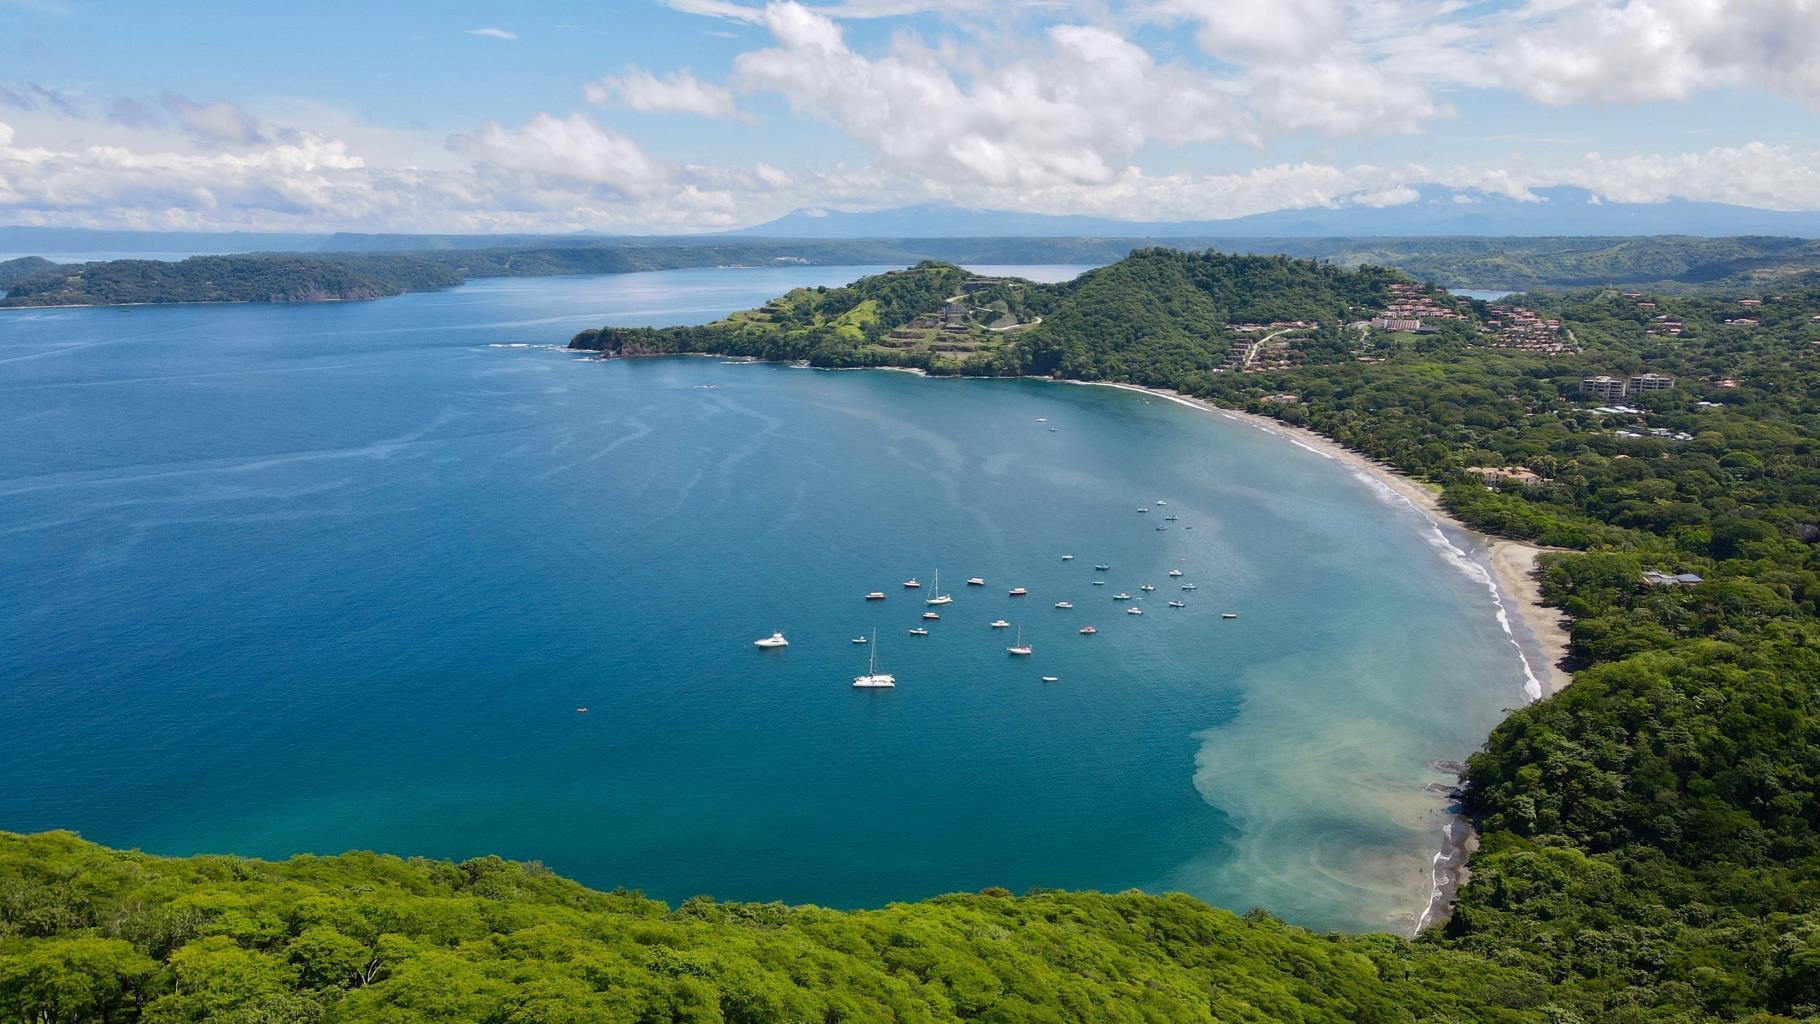 Drone shot of Playa Hermosa